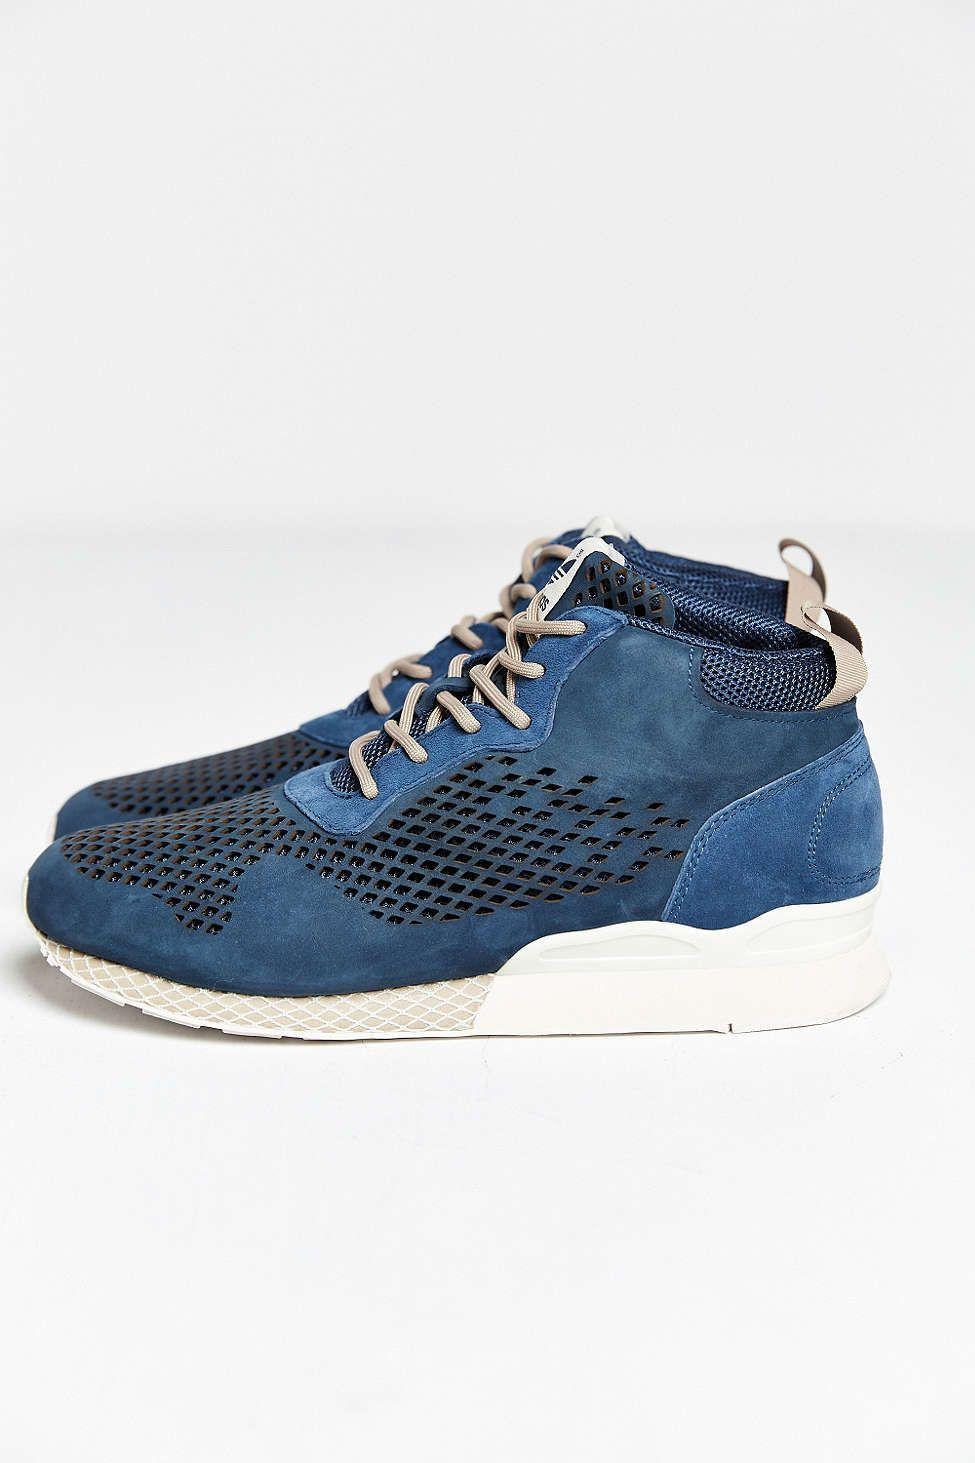 Adidas originali blu zxz 930 - chukka scarpe shopping per donne